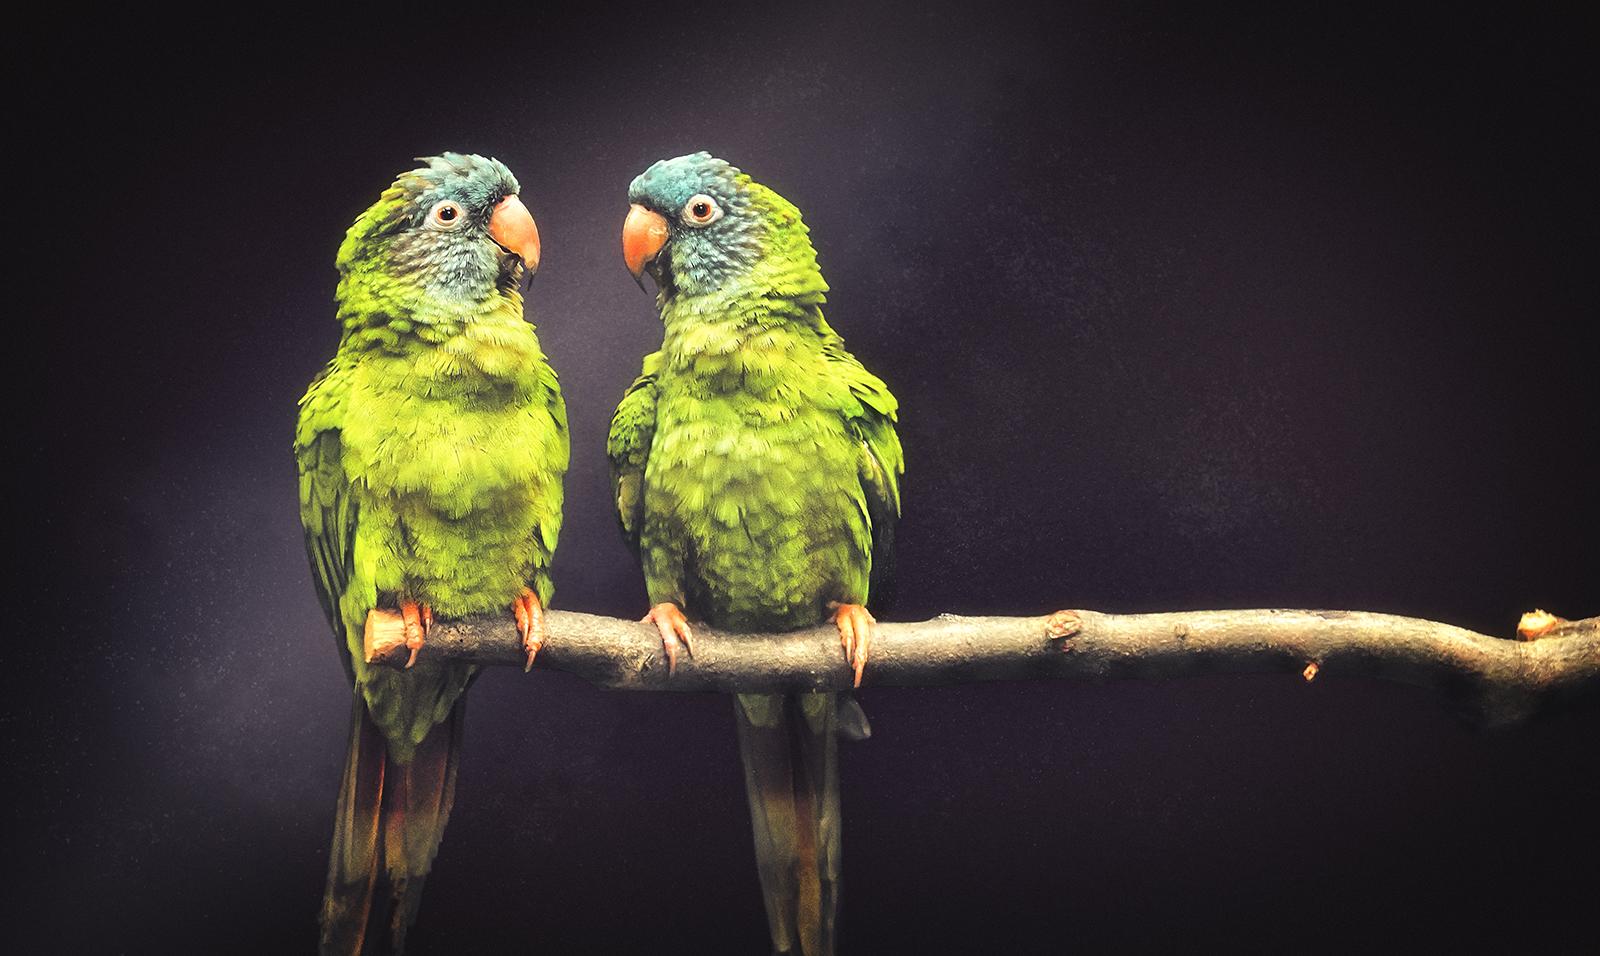 A Pair of Green Parrots